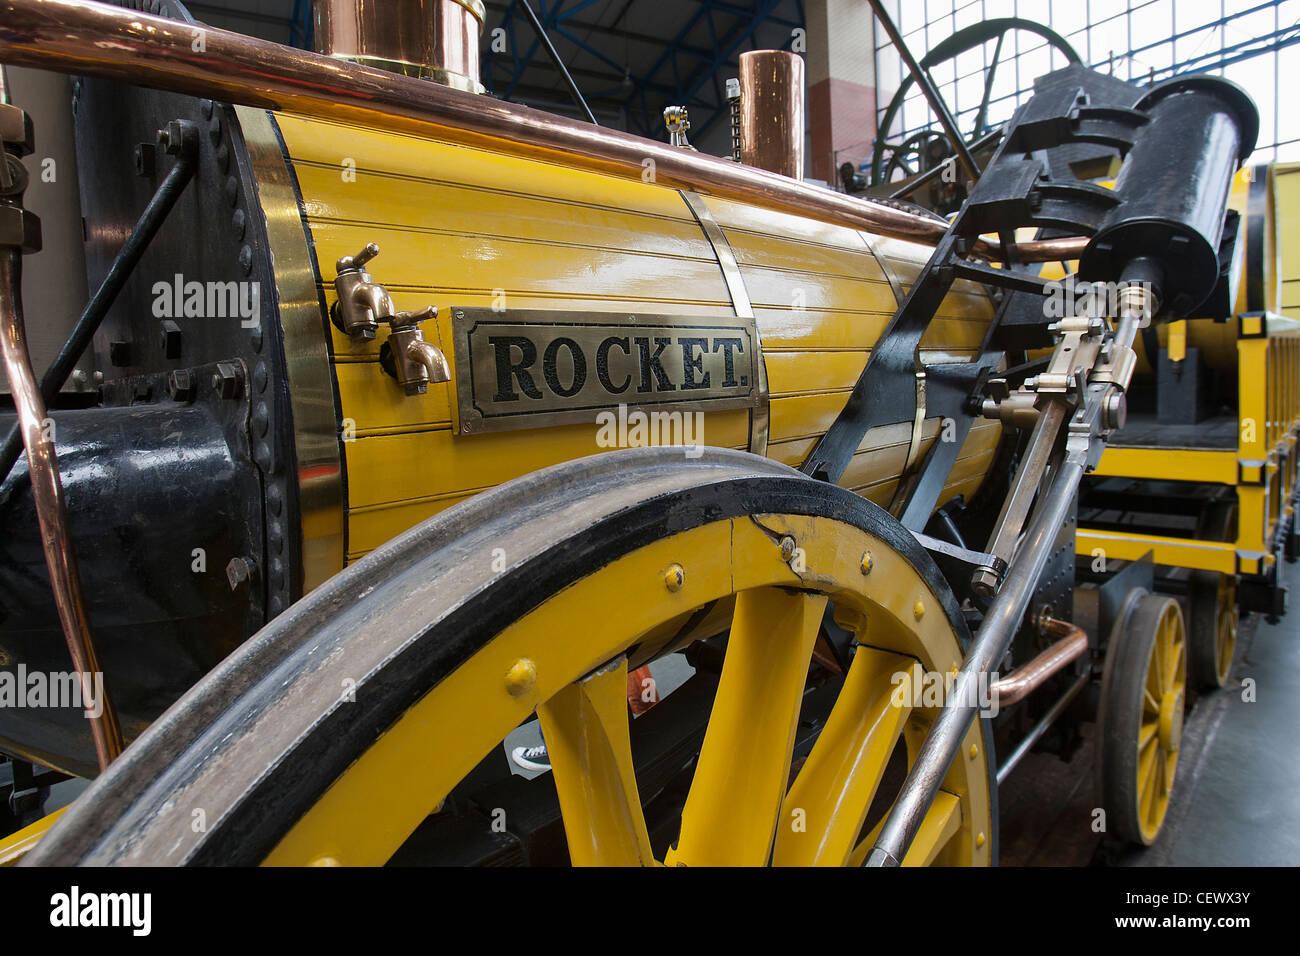 replica george stephensons rocket at the national railway museum york uk stock image